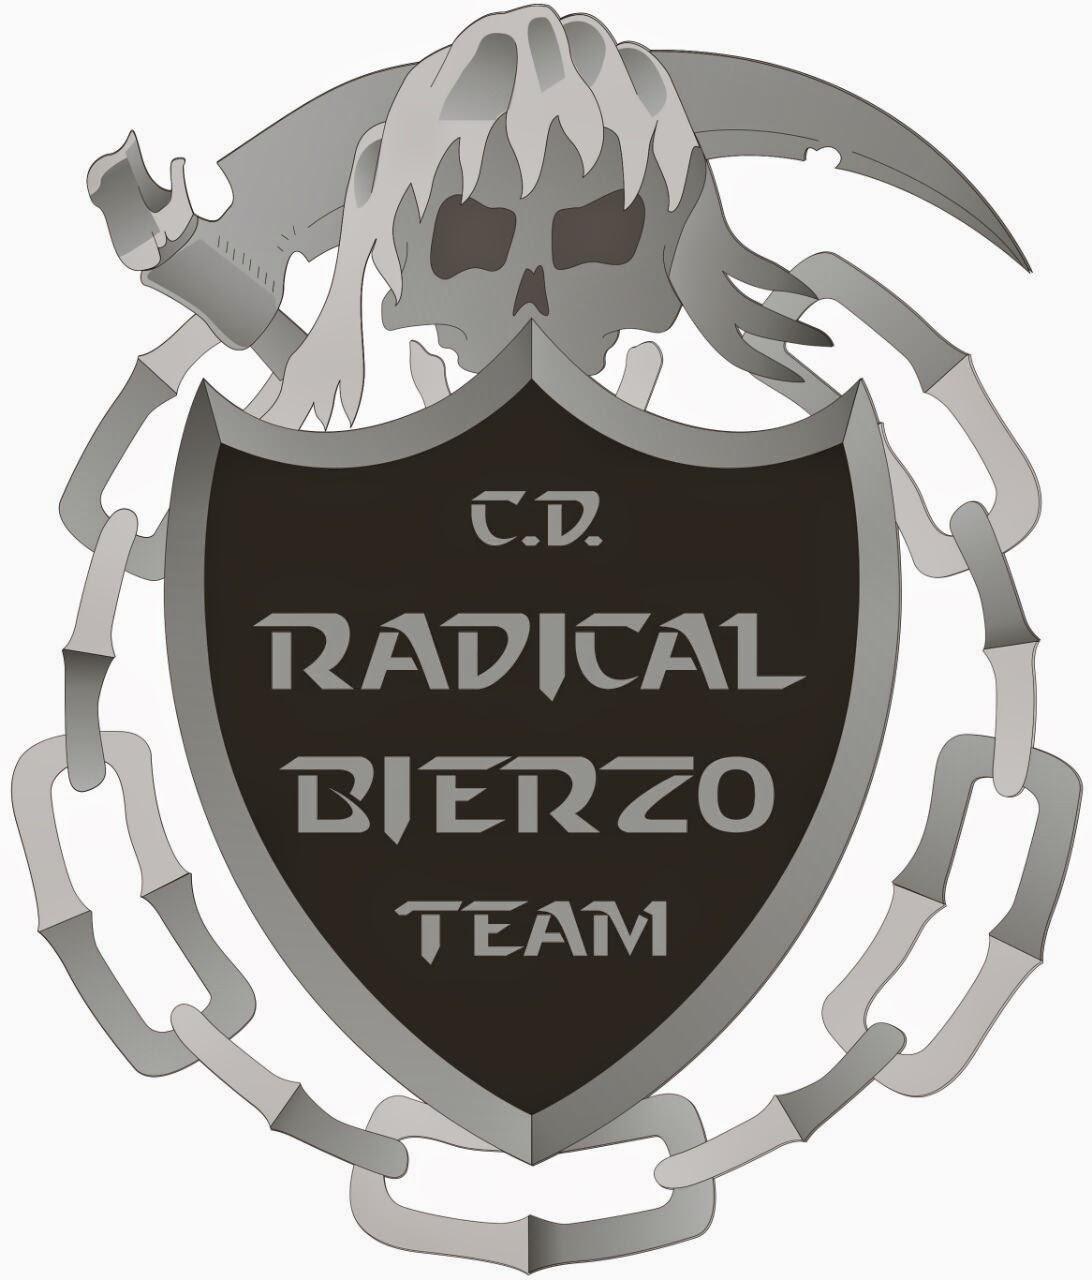 C.D.Radical Bierzo Team